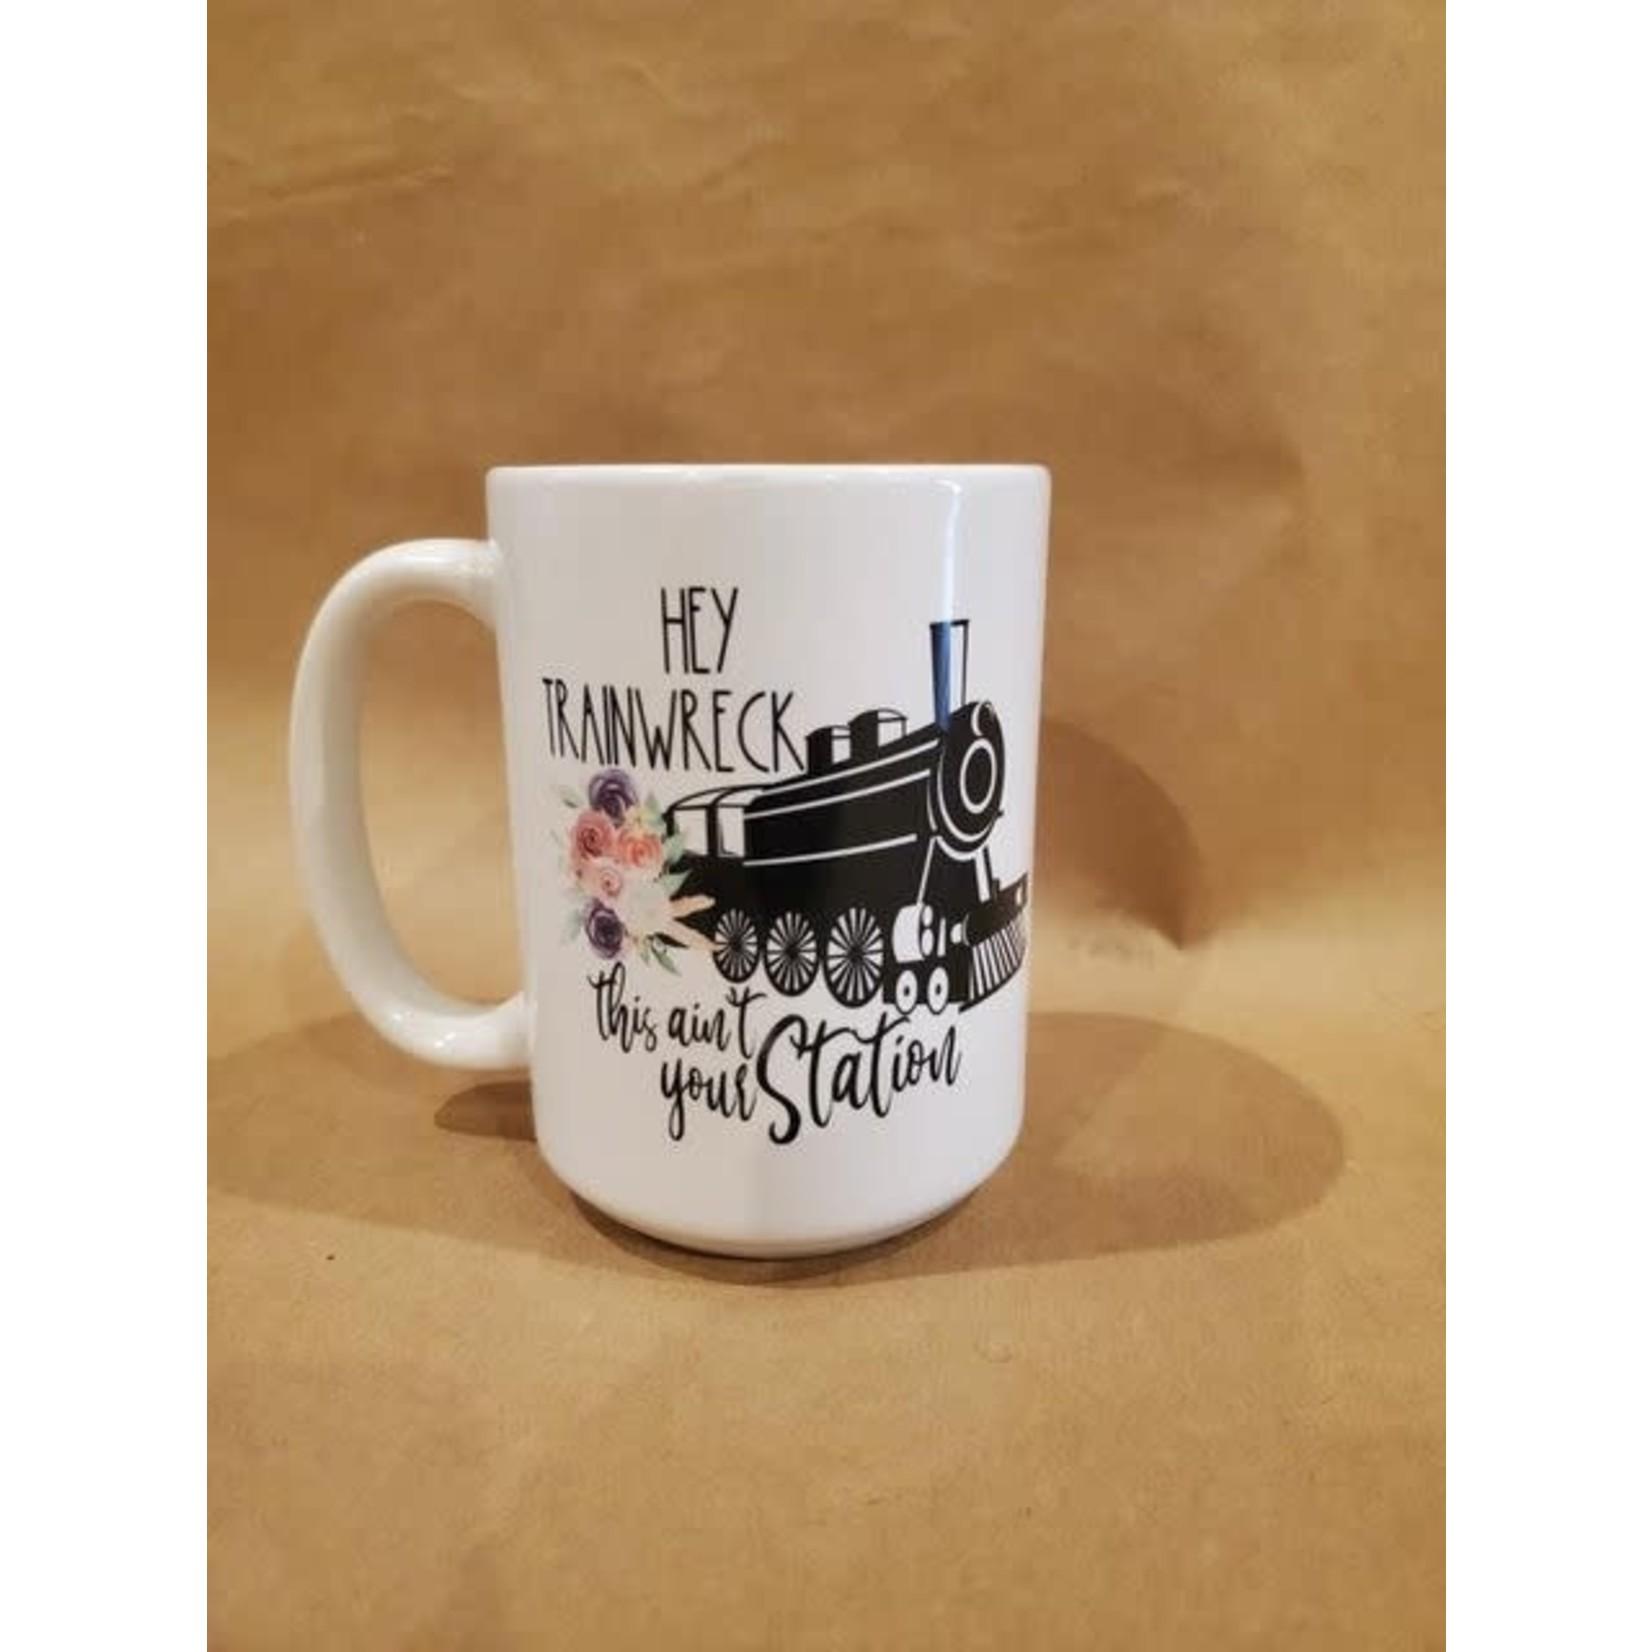 Favourite Textiles Hey trainwreck mug